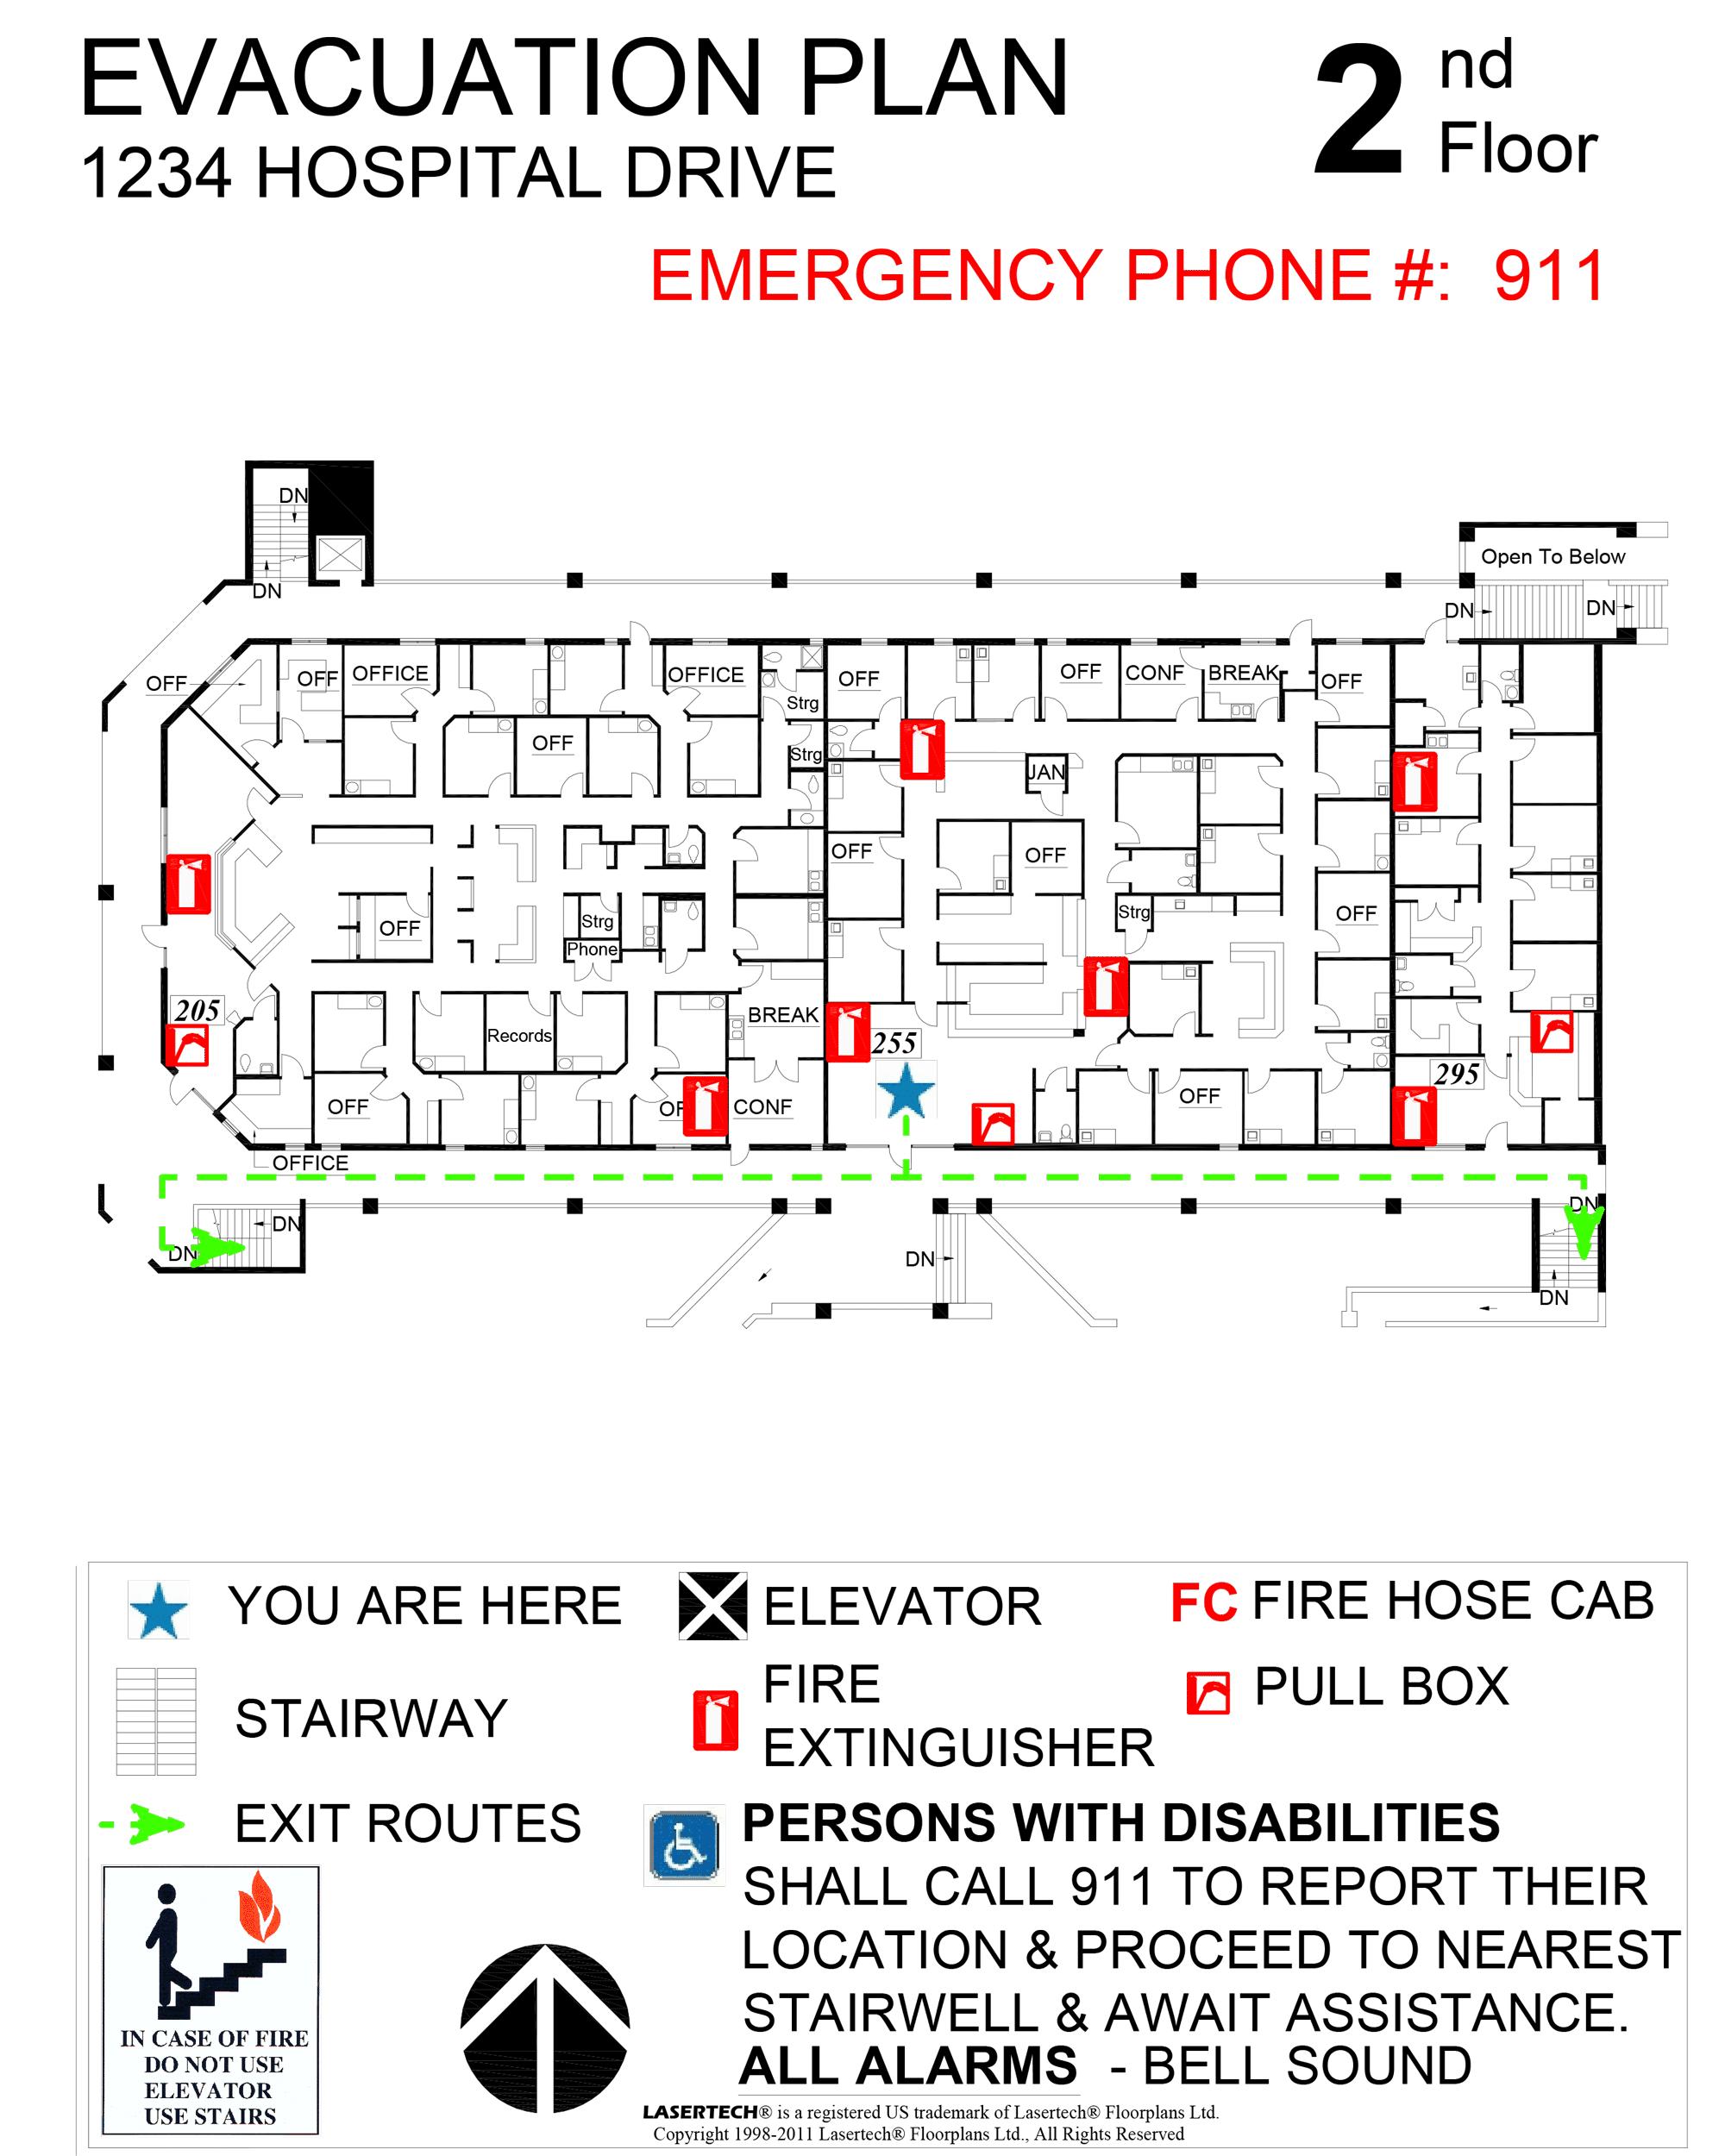 Emergency Evacuation Plans - Lasertech Floorplans